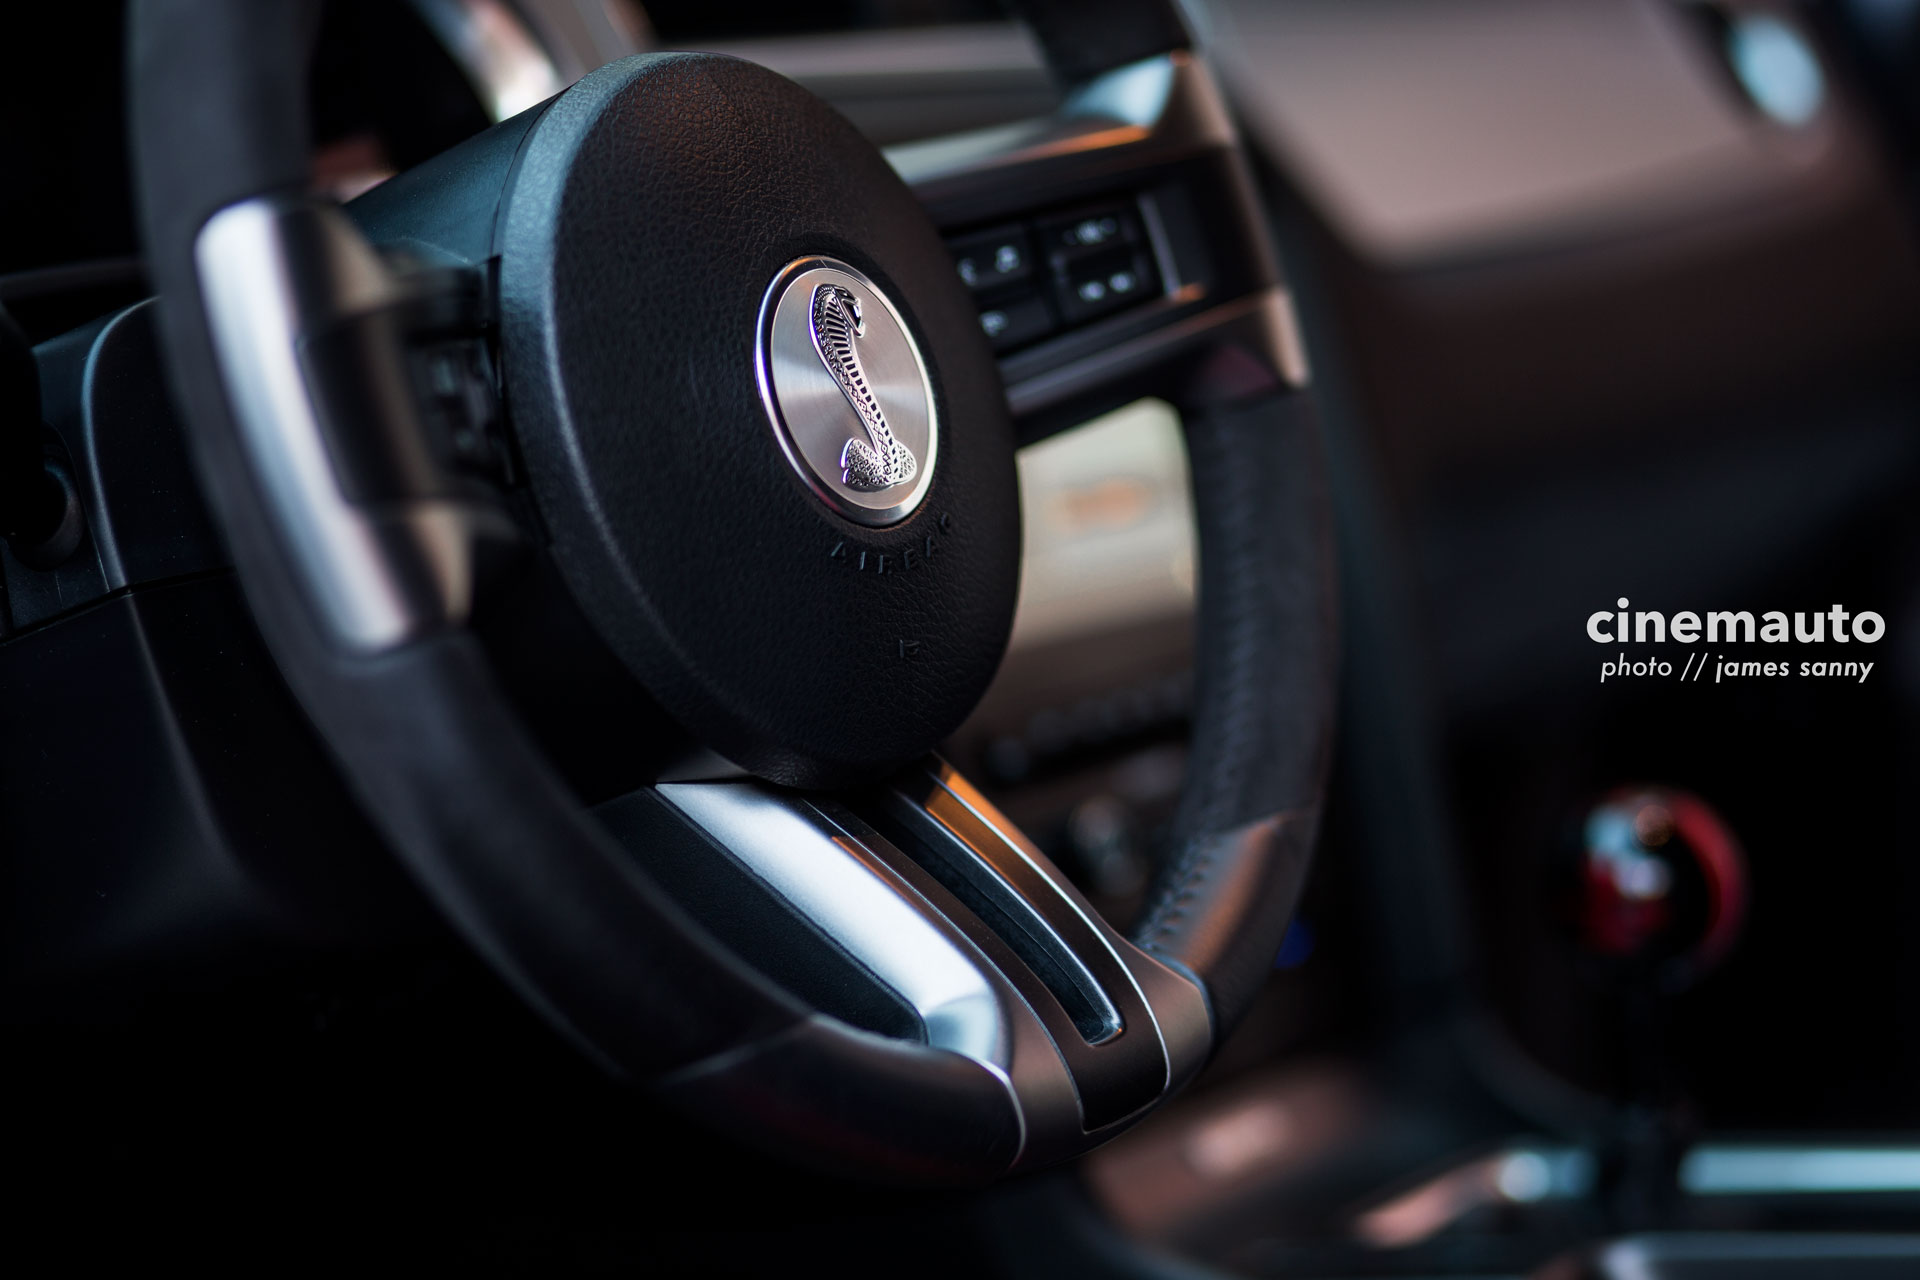 cinemauto-wichita-automotive-photography-cj7a.jpg